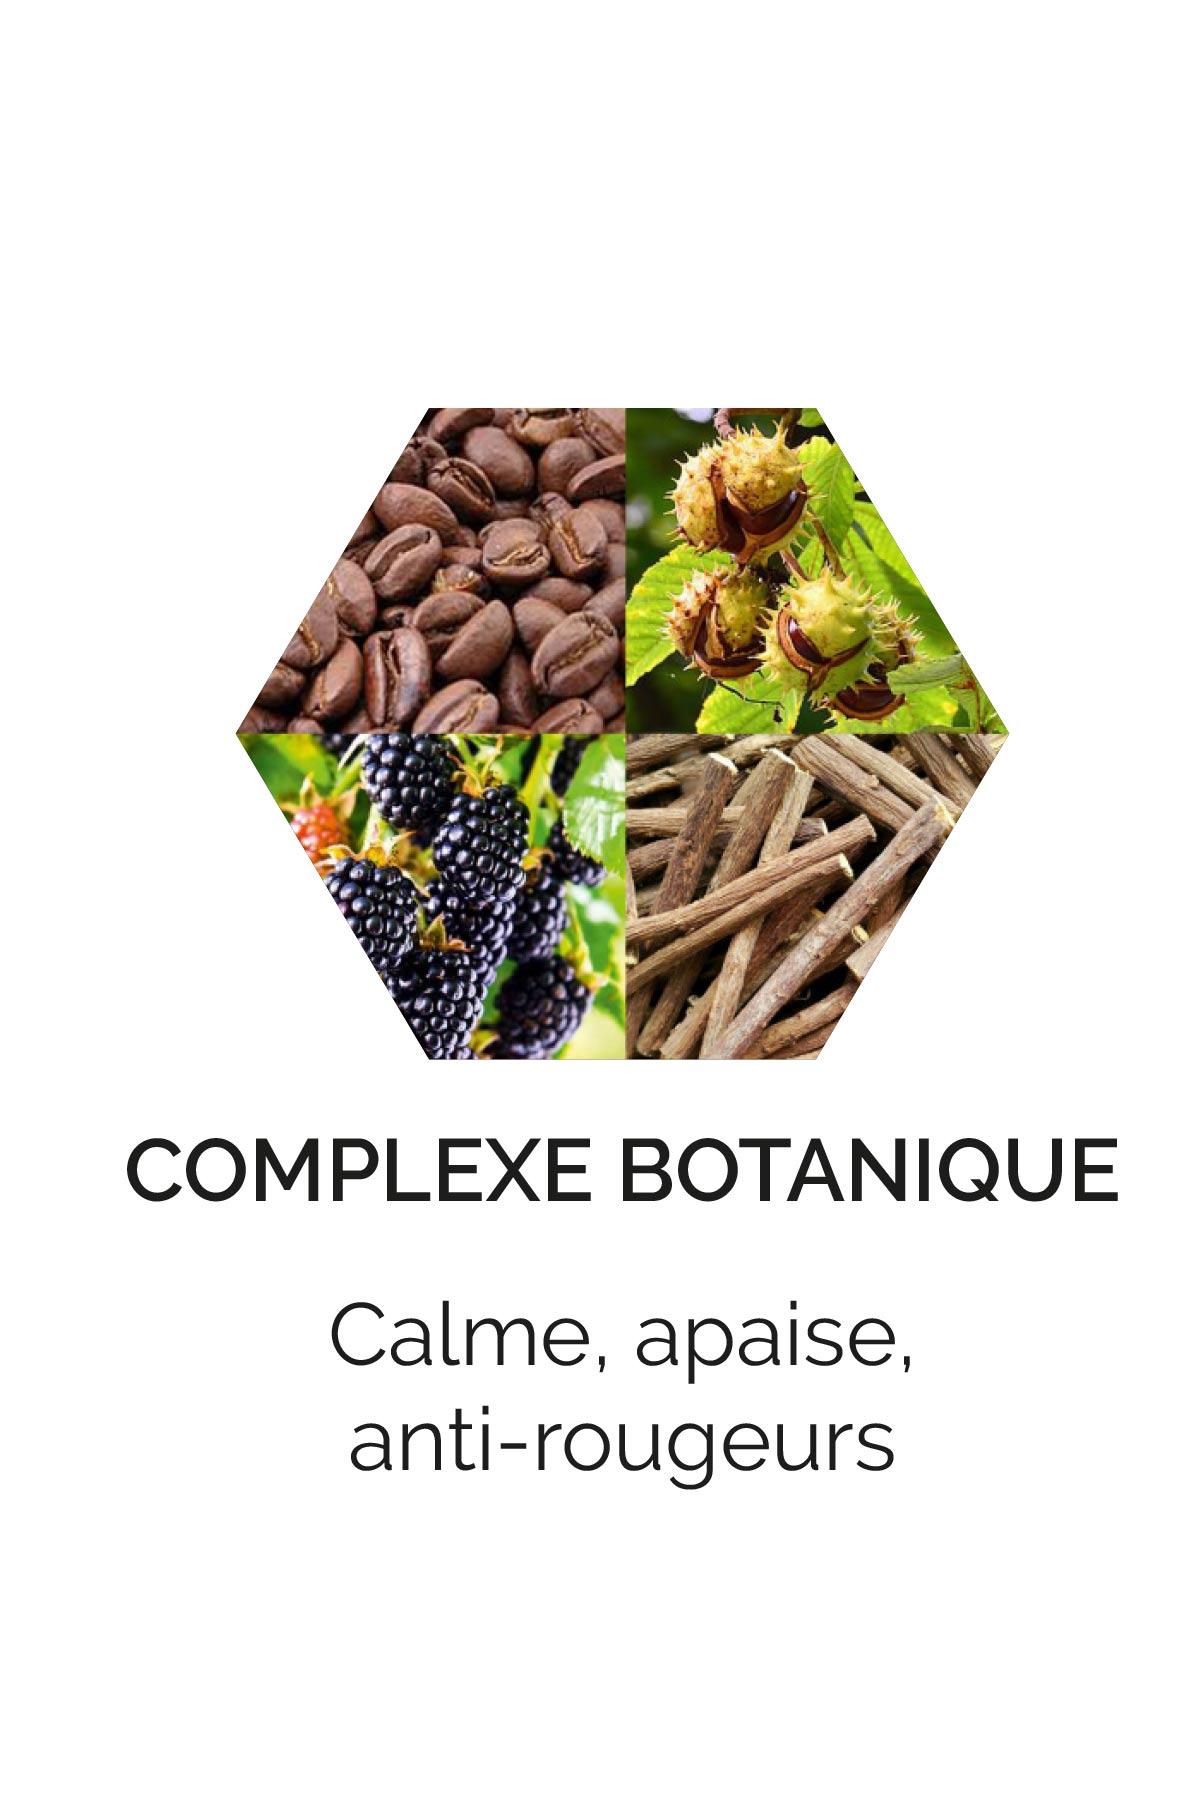 Complexe botanique